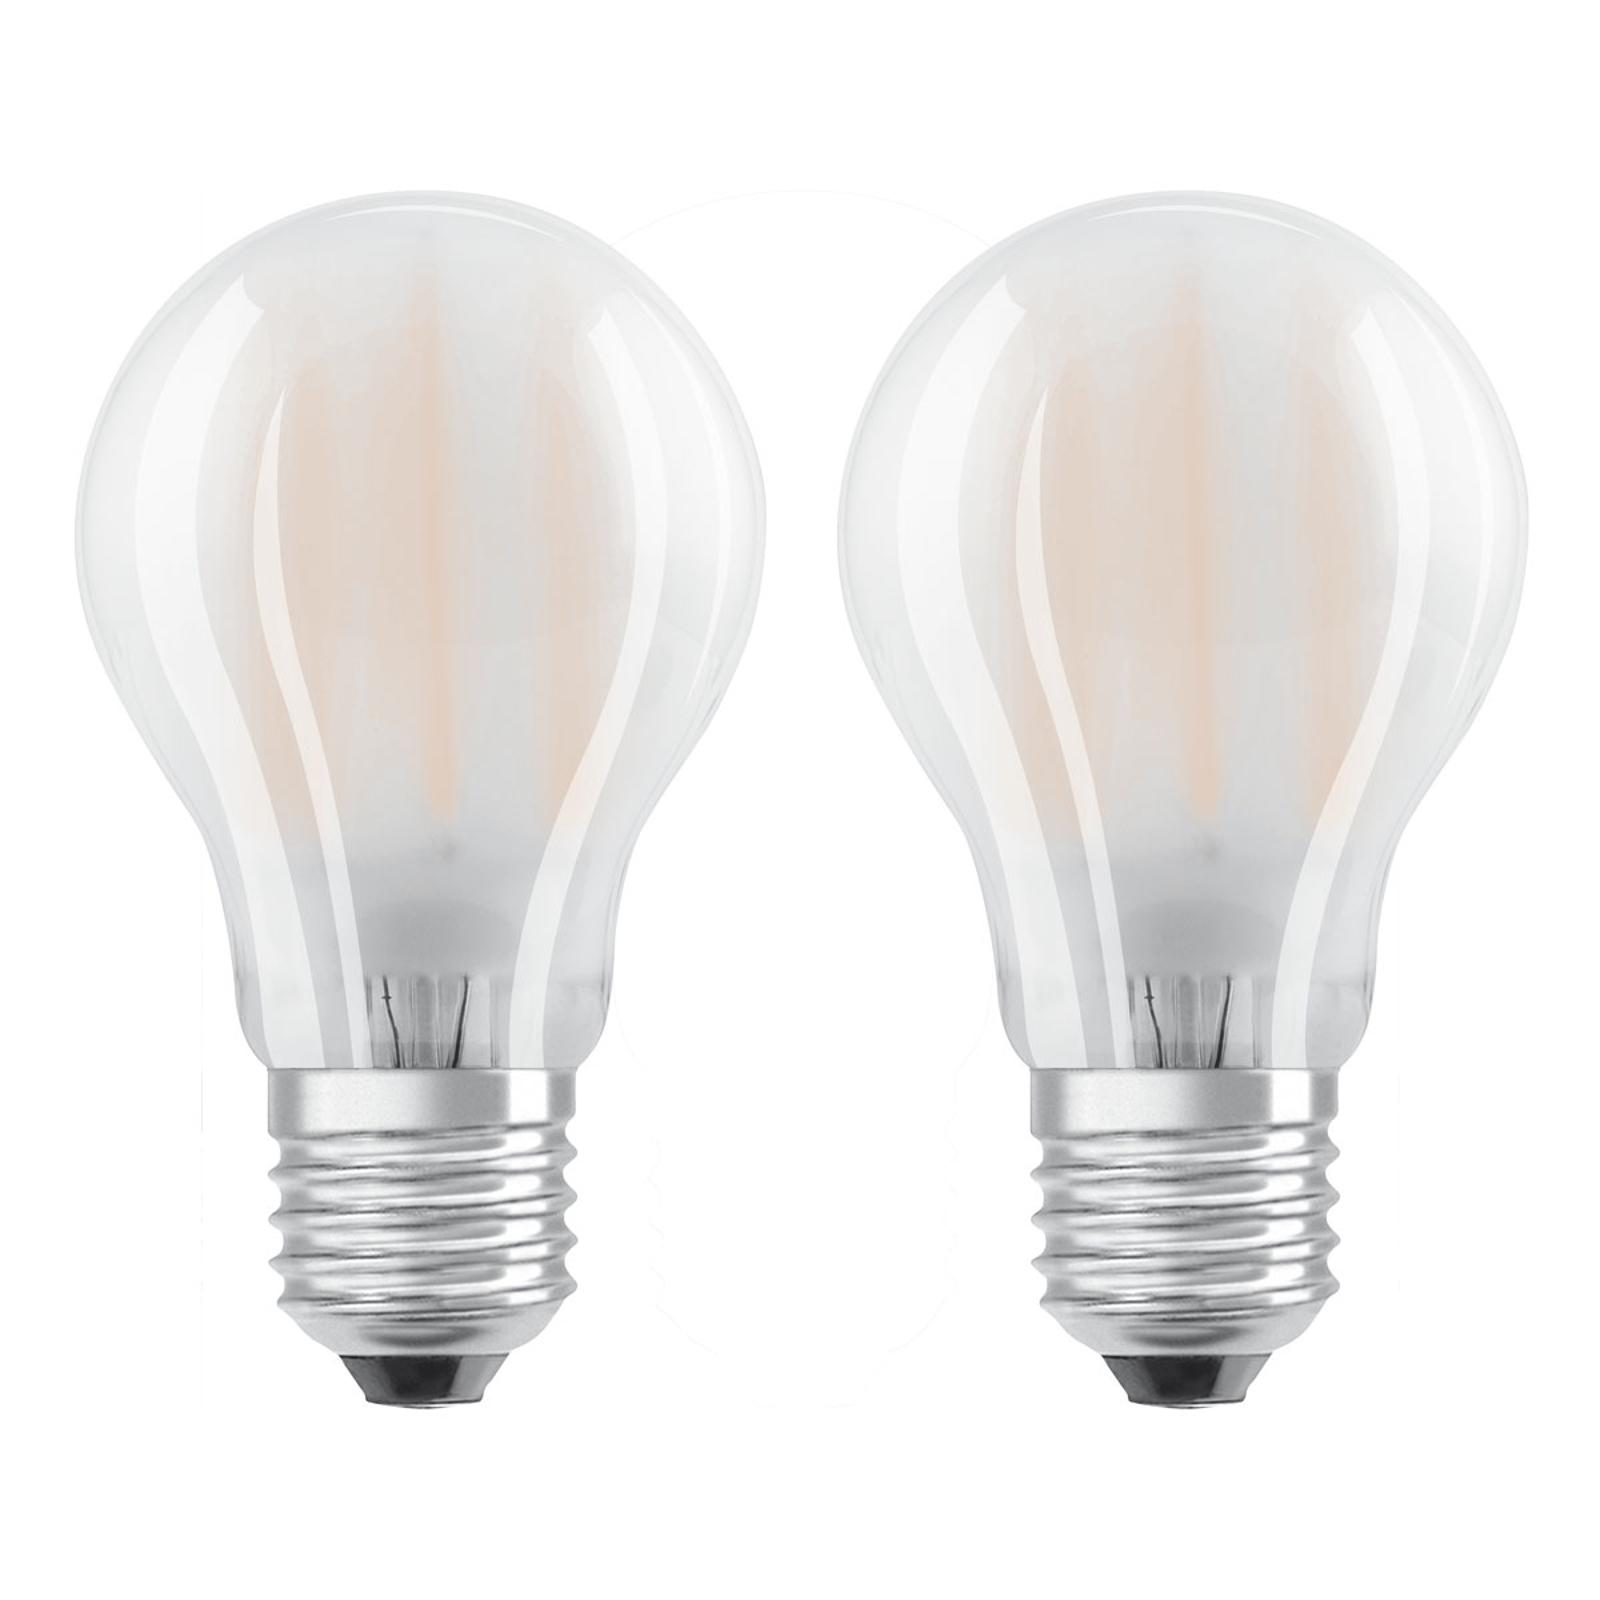 OSRAM LED-Lampe E27 4W warmweiß im 2er-Set